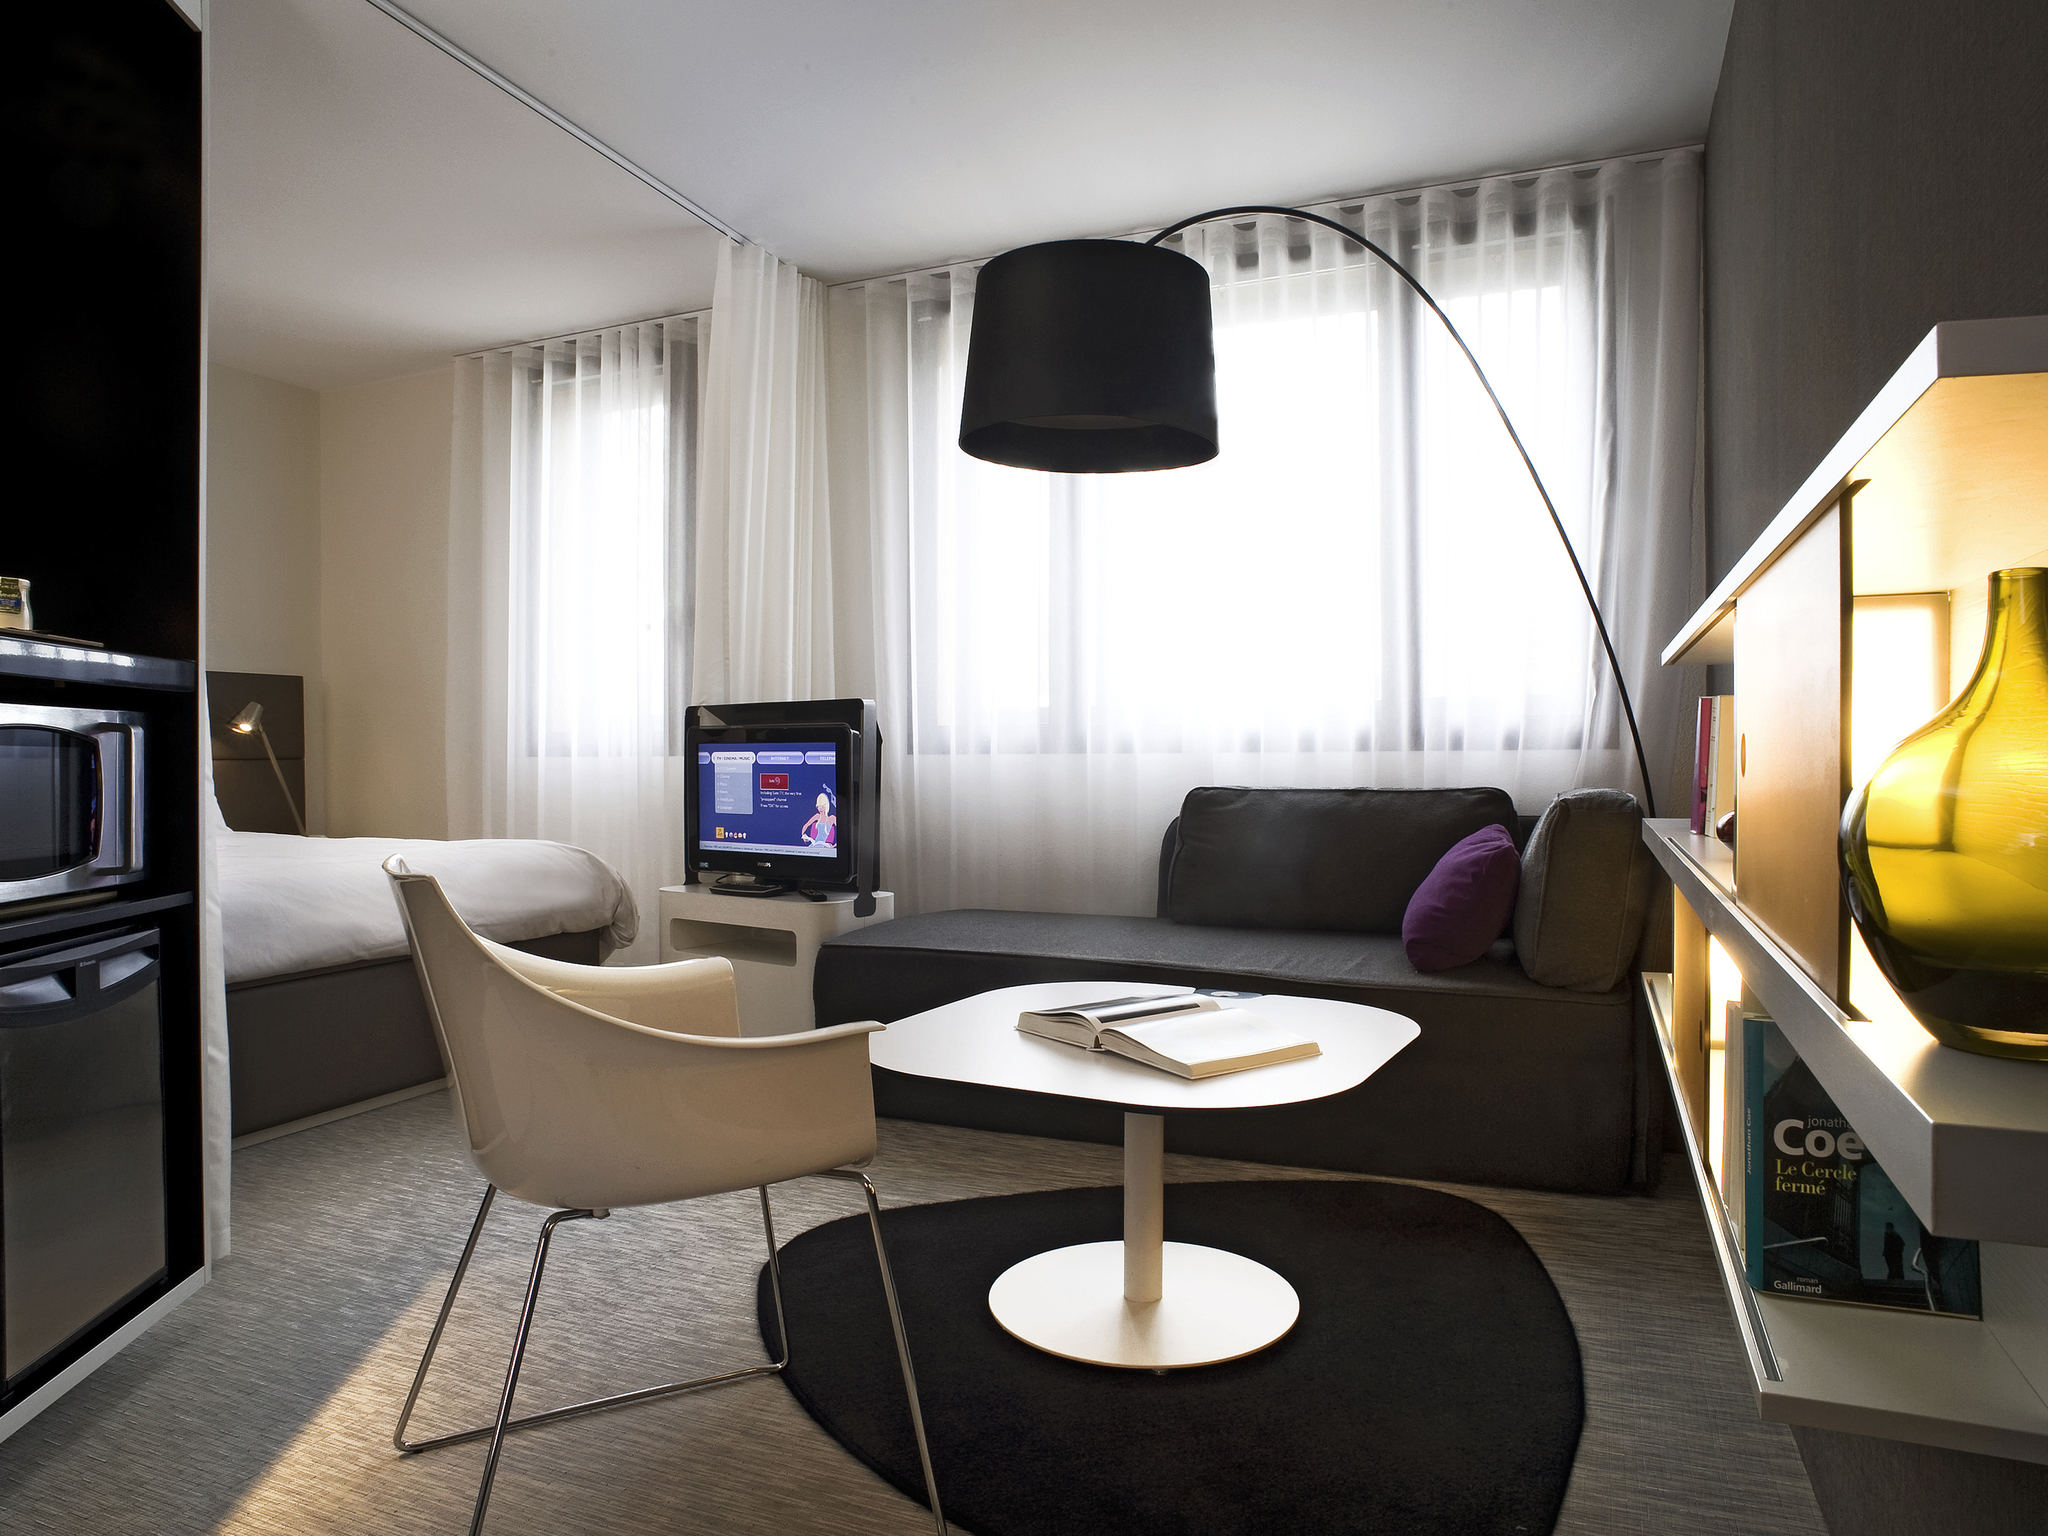 Hotel – Novotel Suites Perpignan Mediterranée